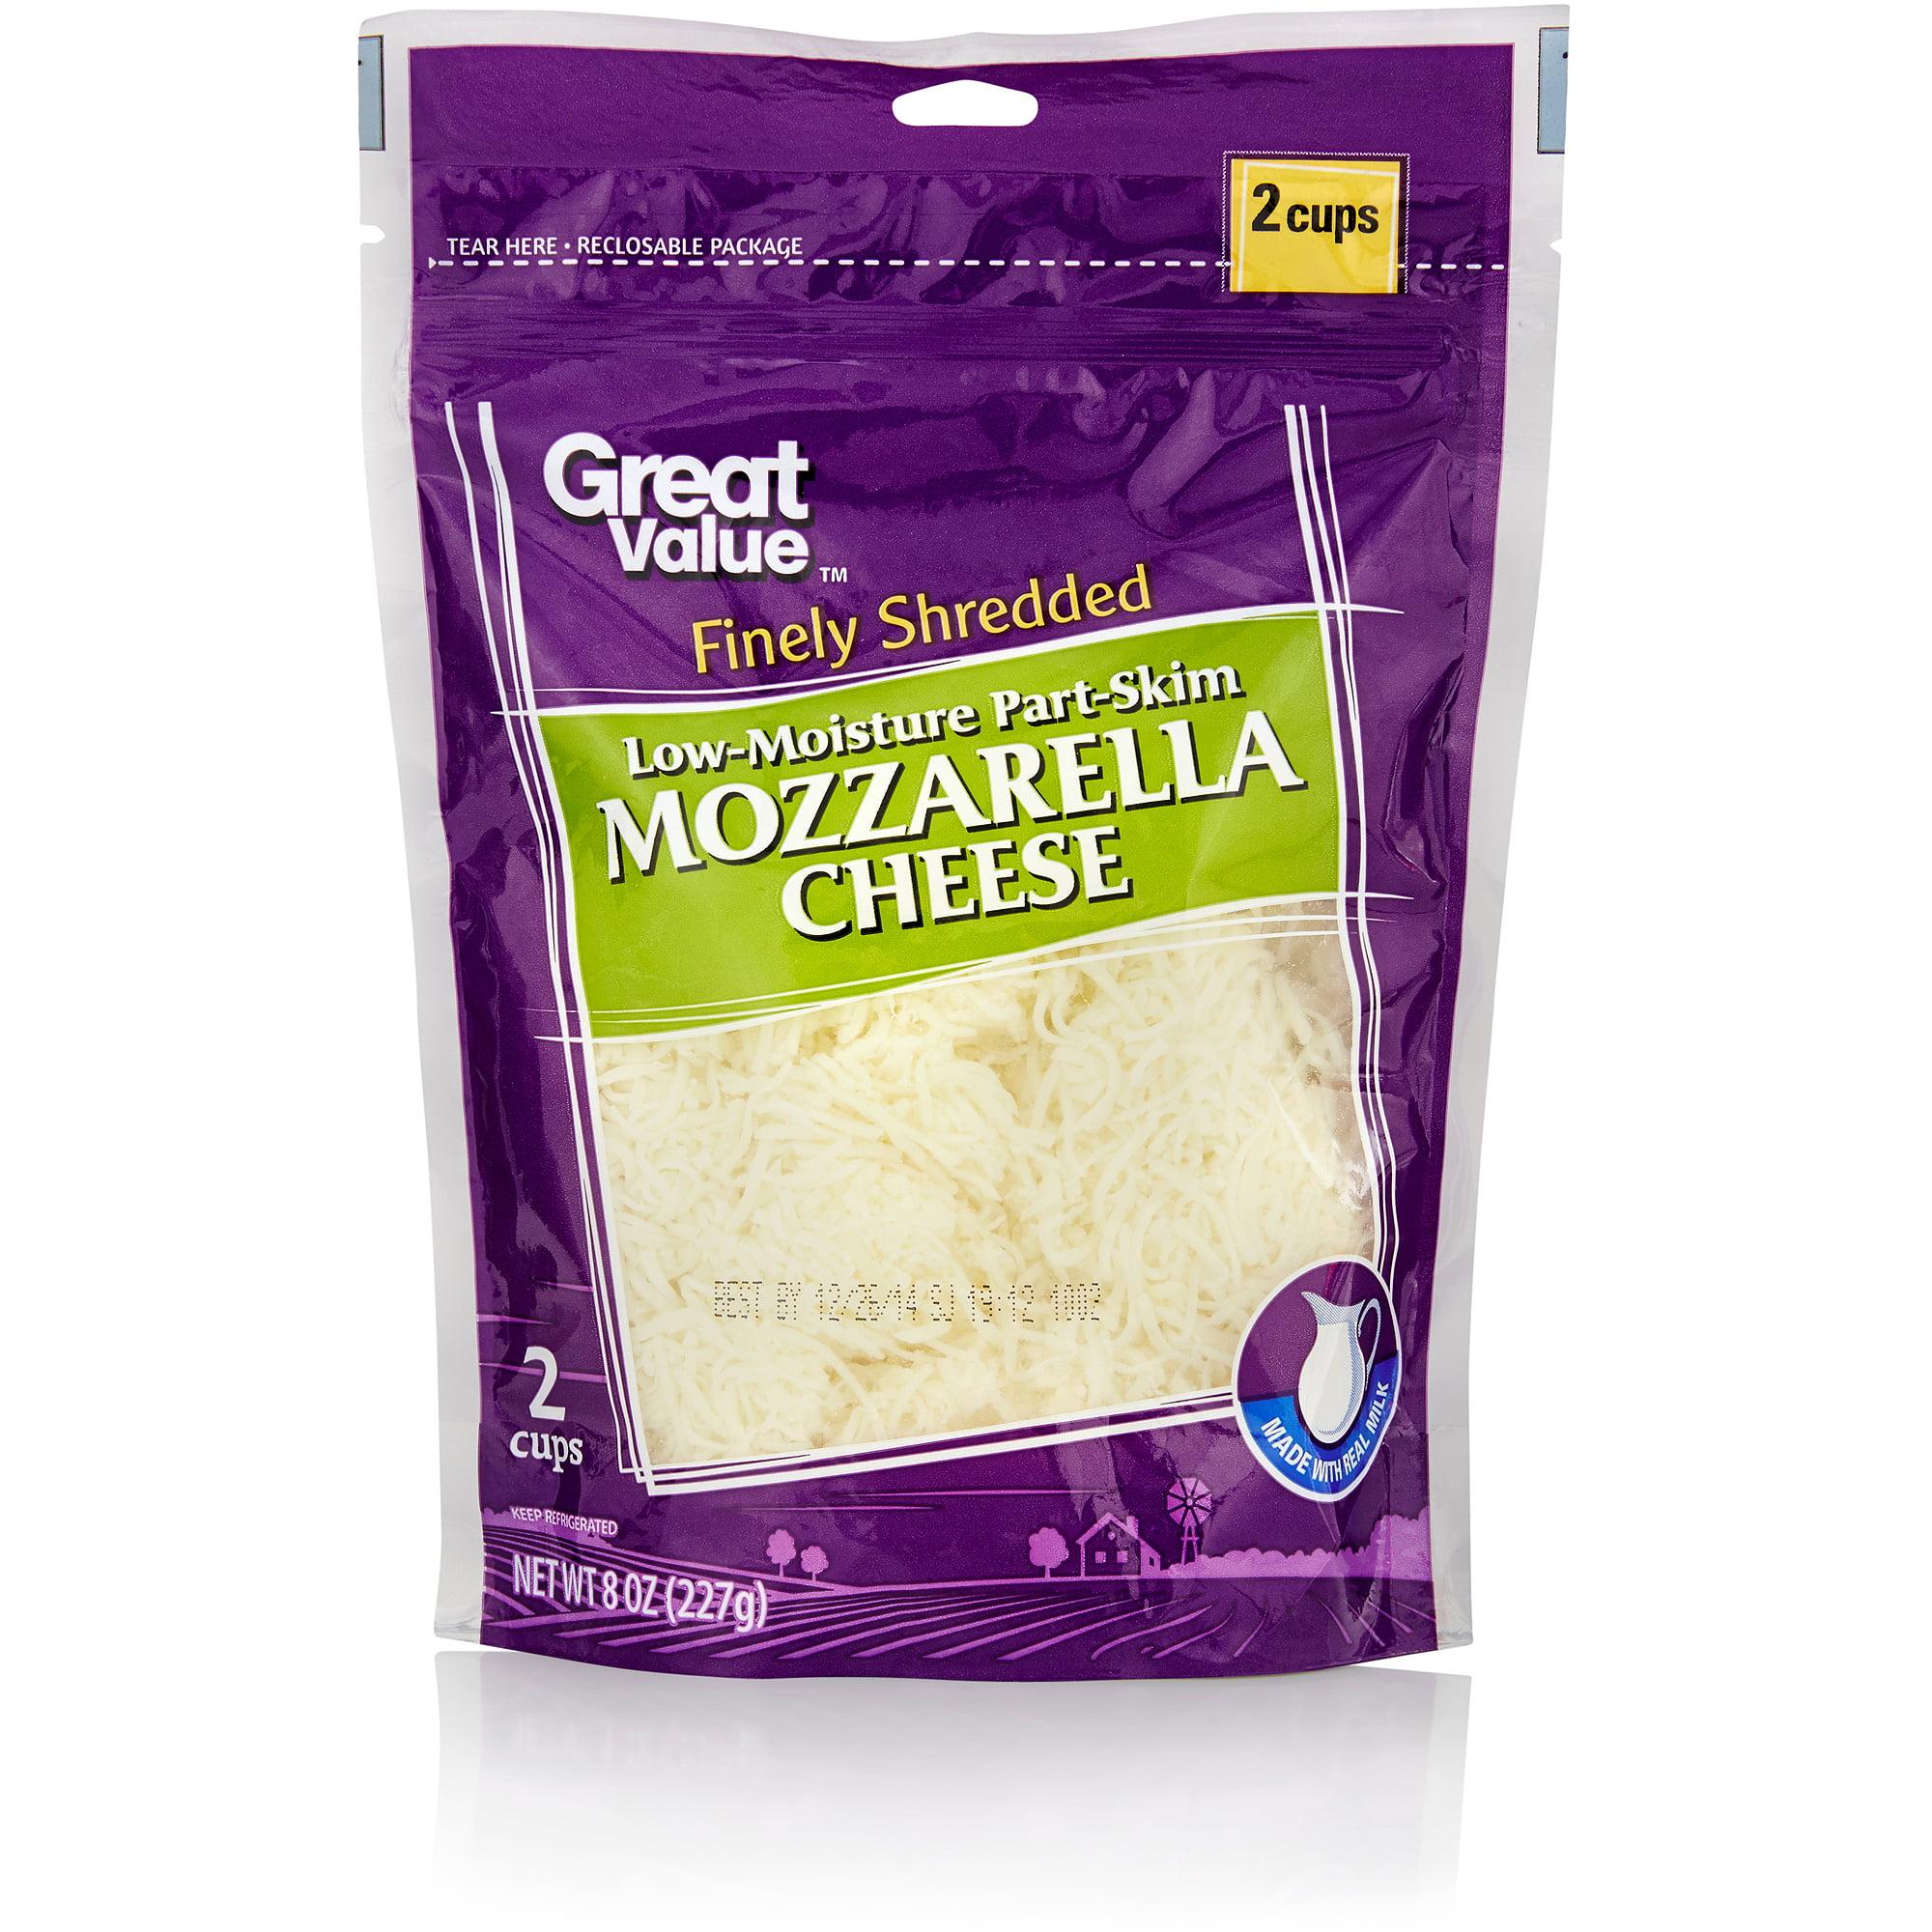 Great Value: Finely Shredded Mozzarella Cheese, 8 Oz